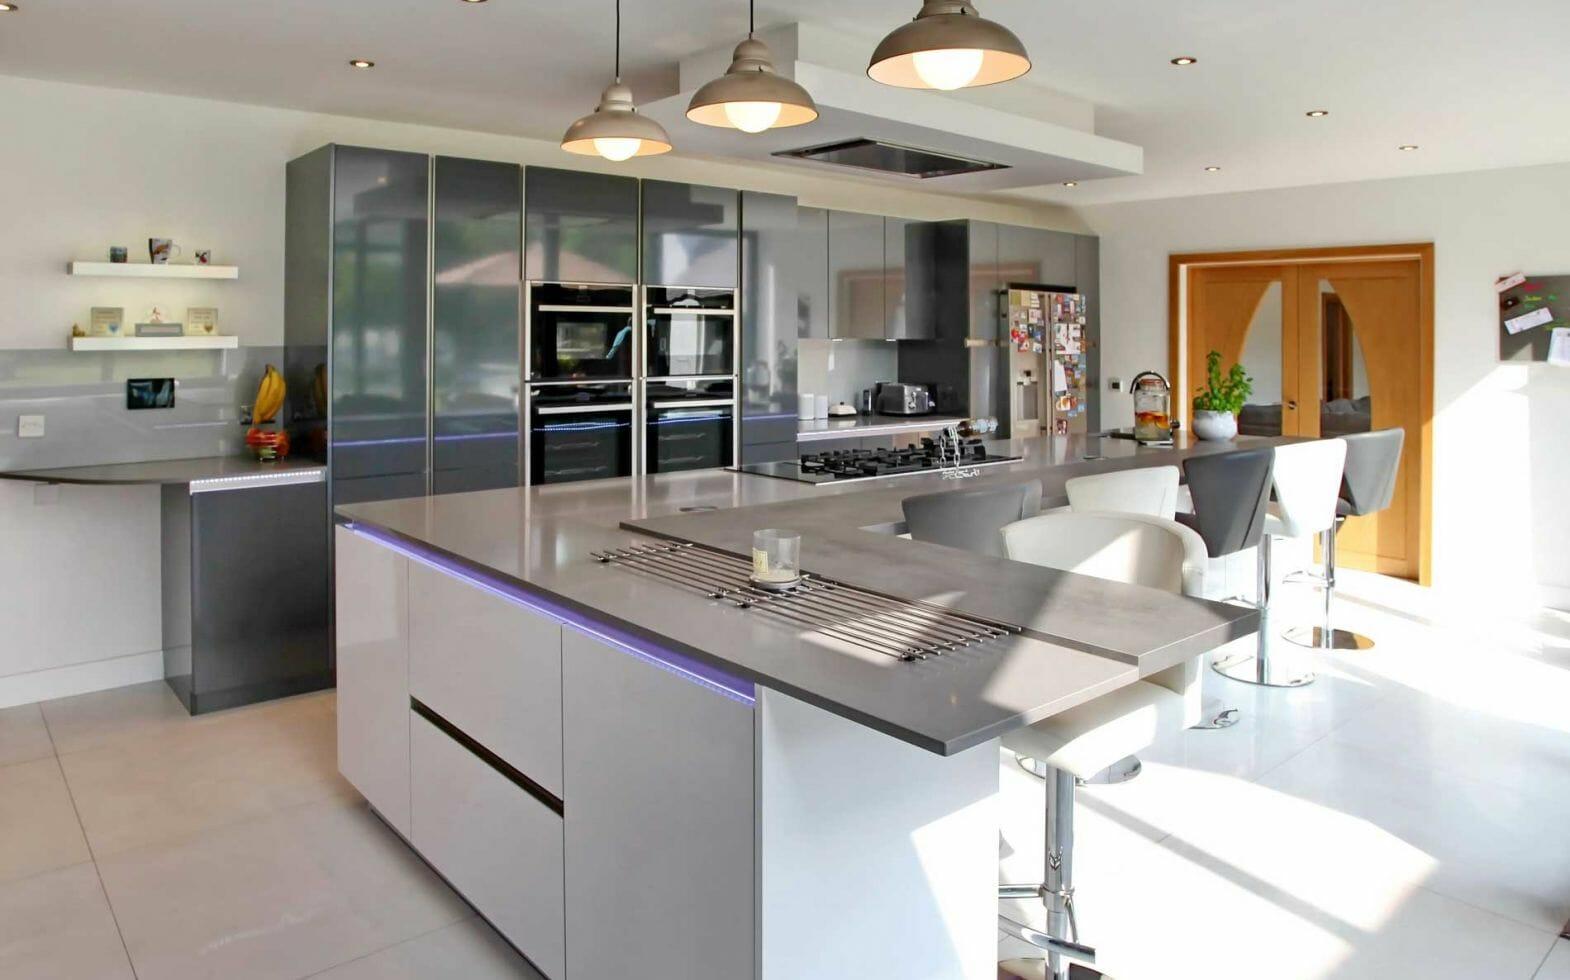 Kitchen example 6